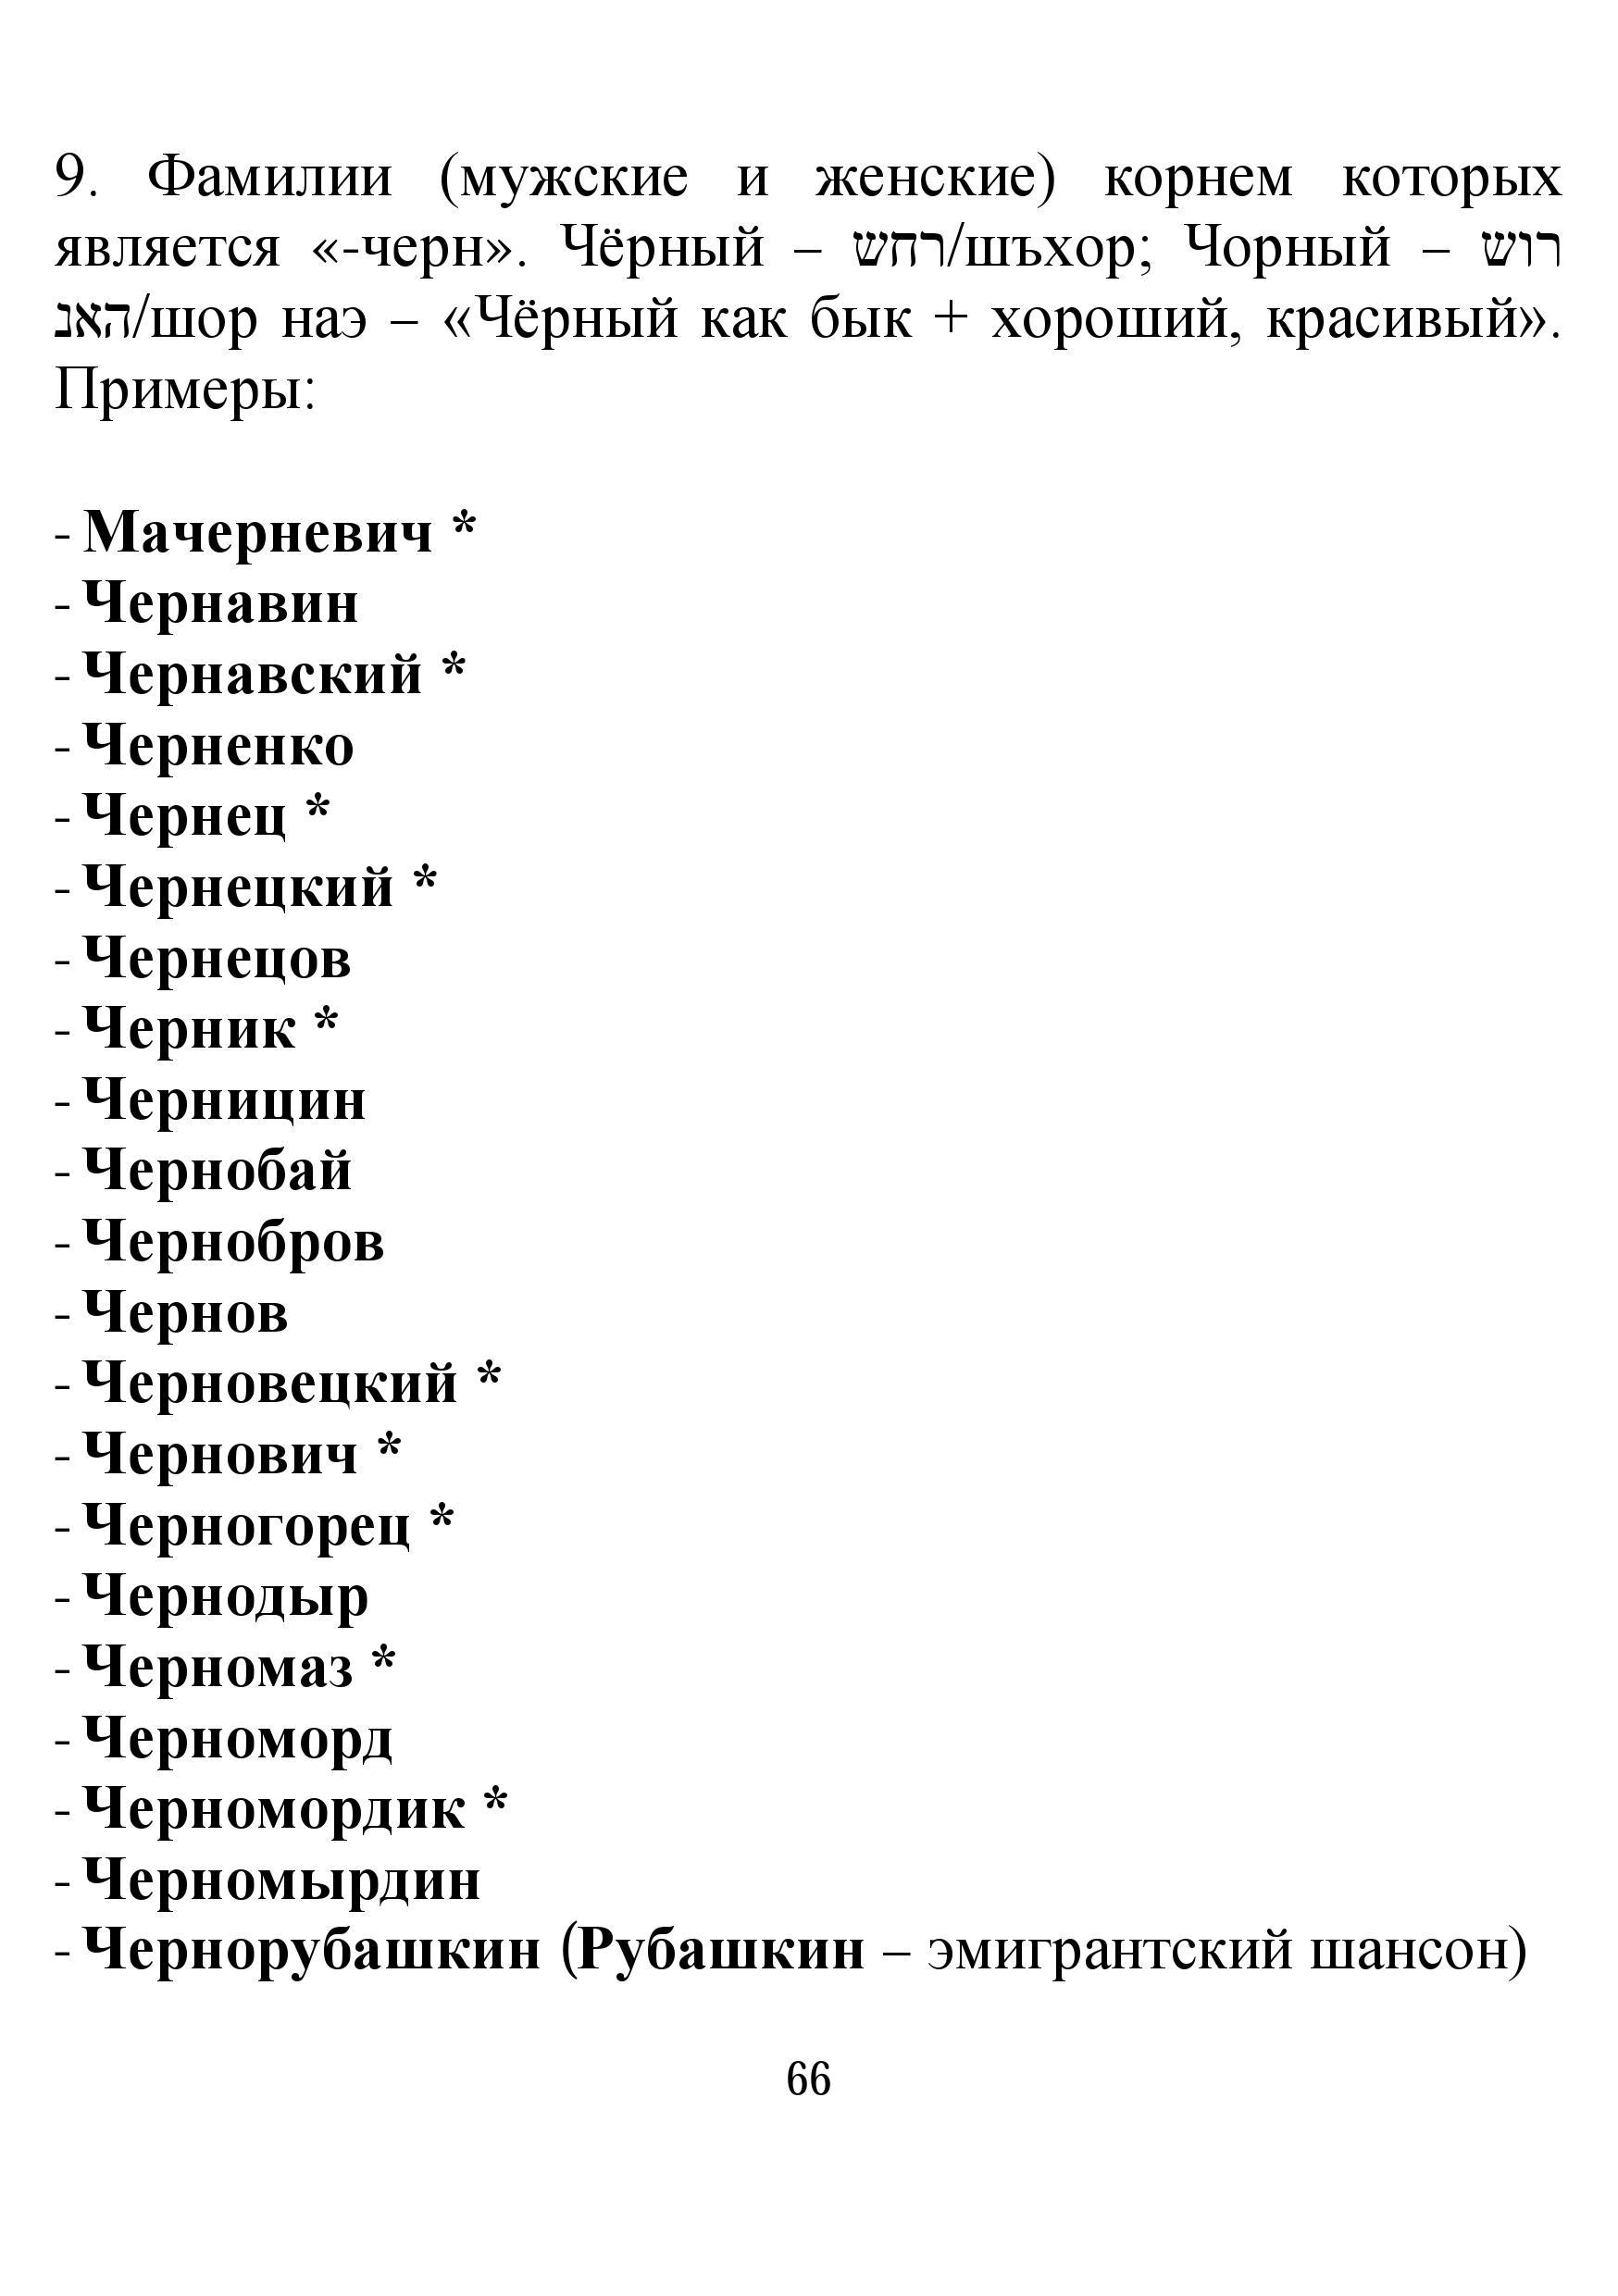 http://s2.uploads.ru/Kvqb9.jpg